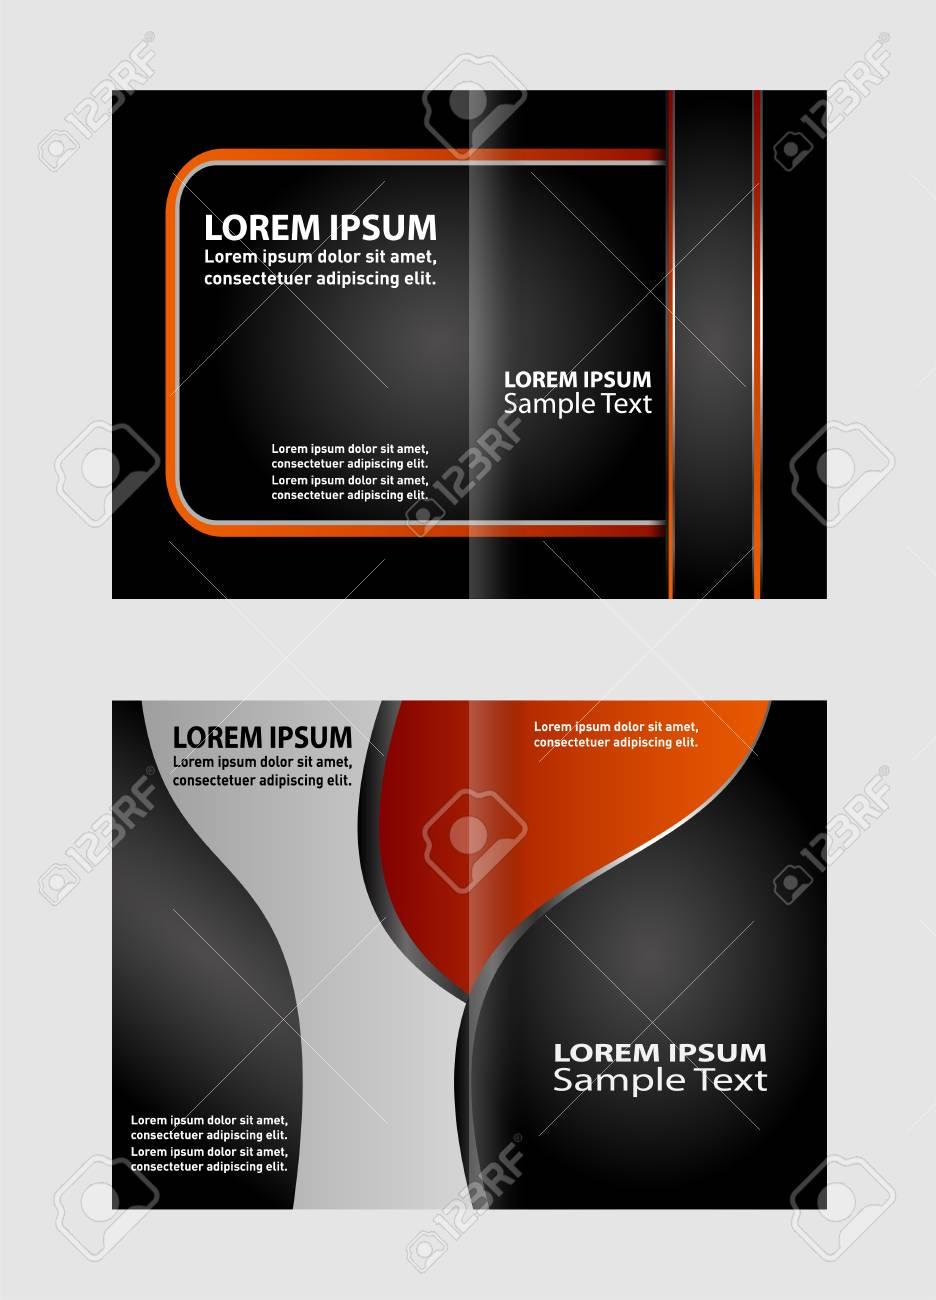 Bi-Fold Brochure Design Templates, Business Leaflet, Booklet Stock Vector -  53840963